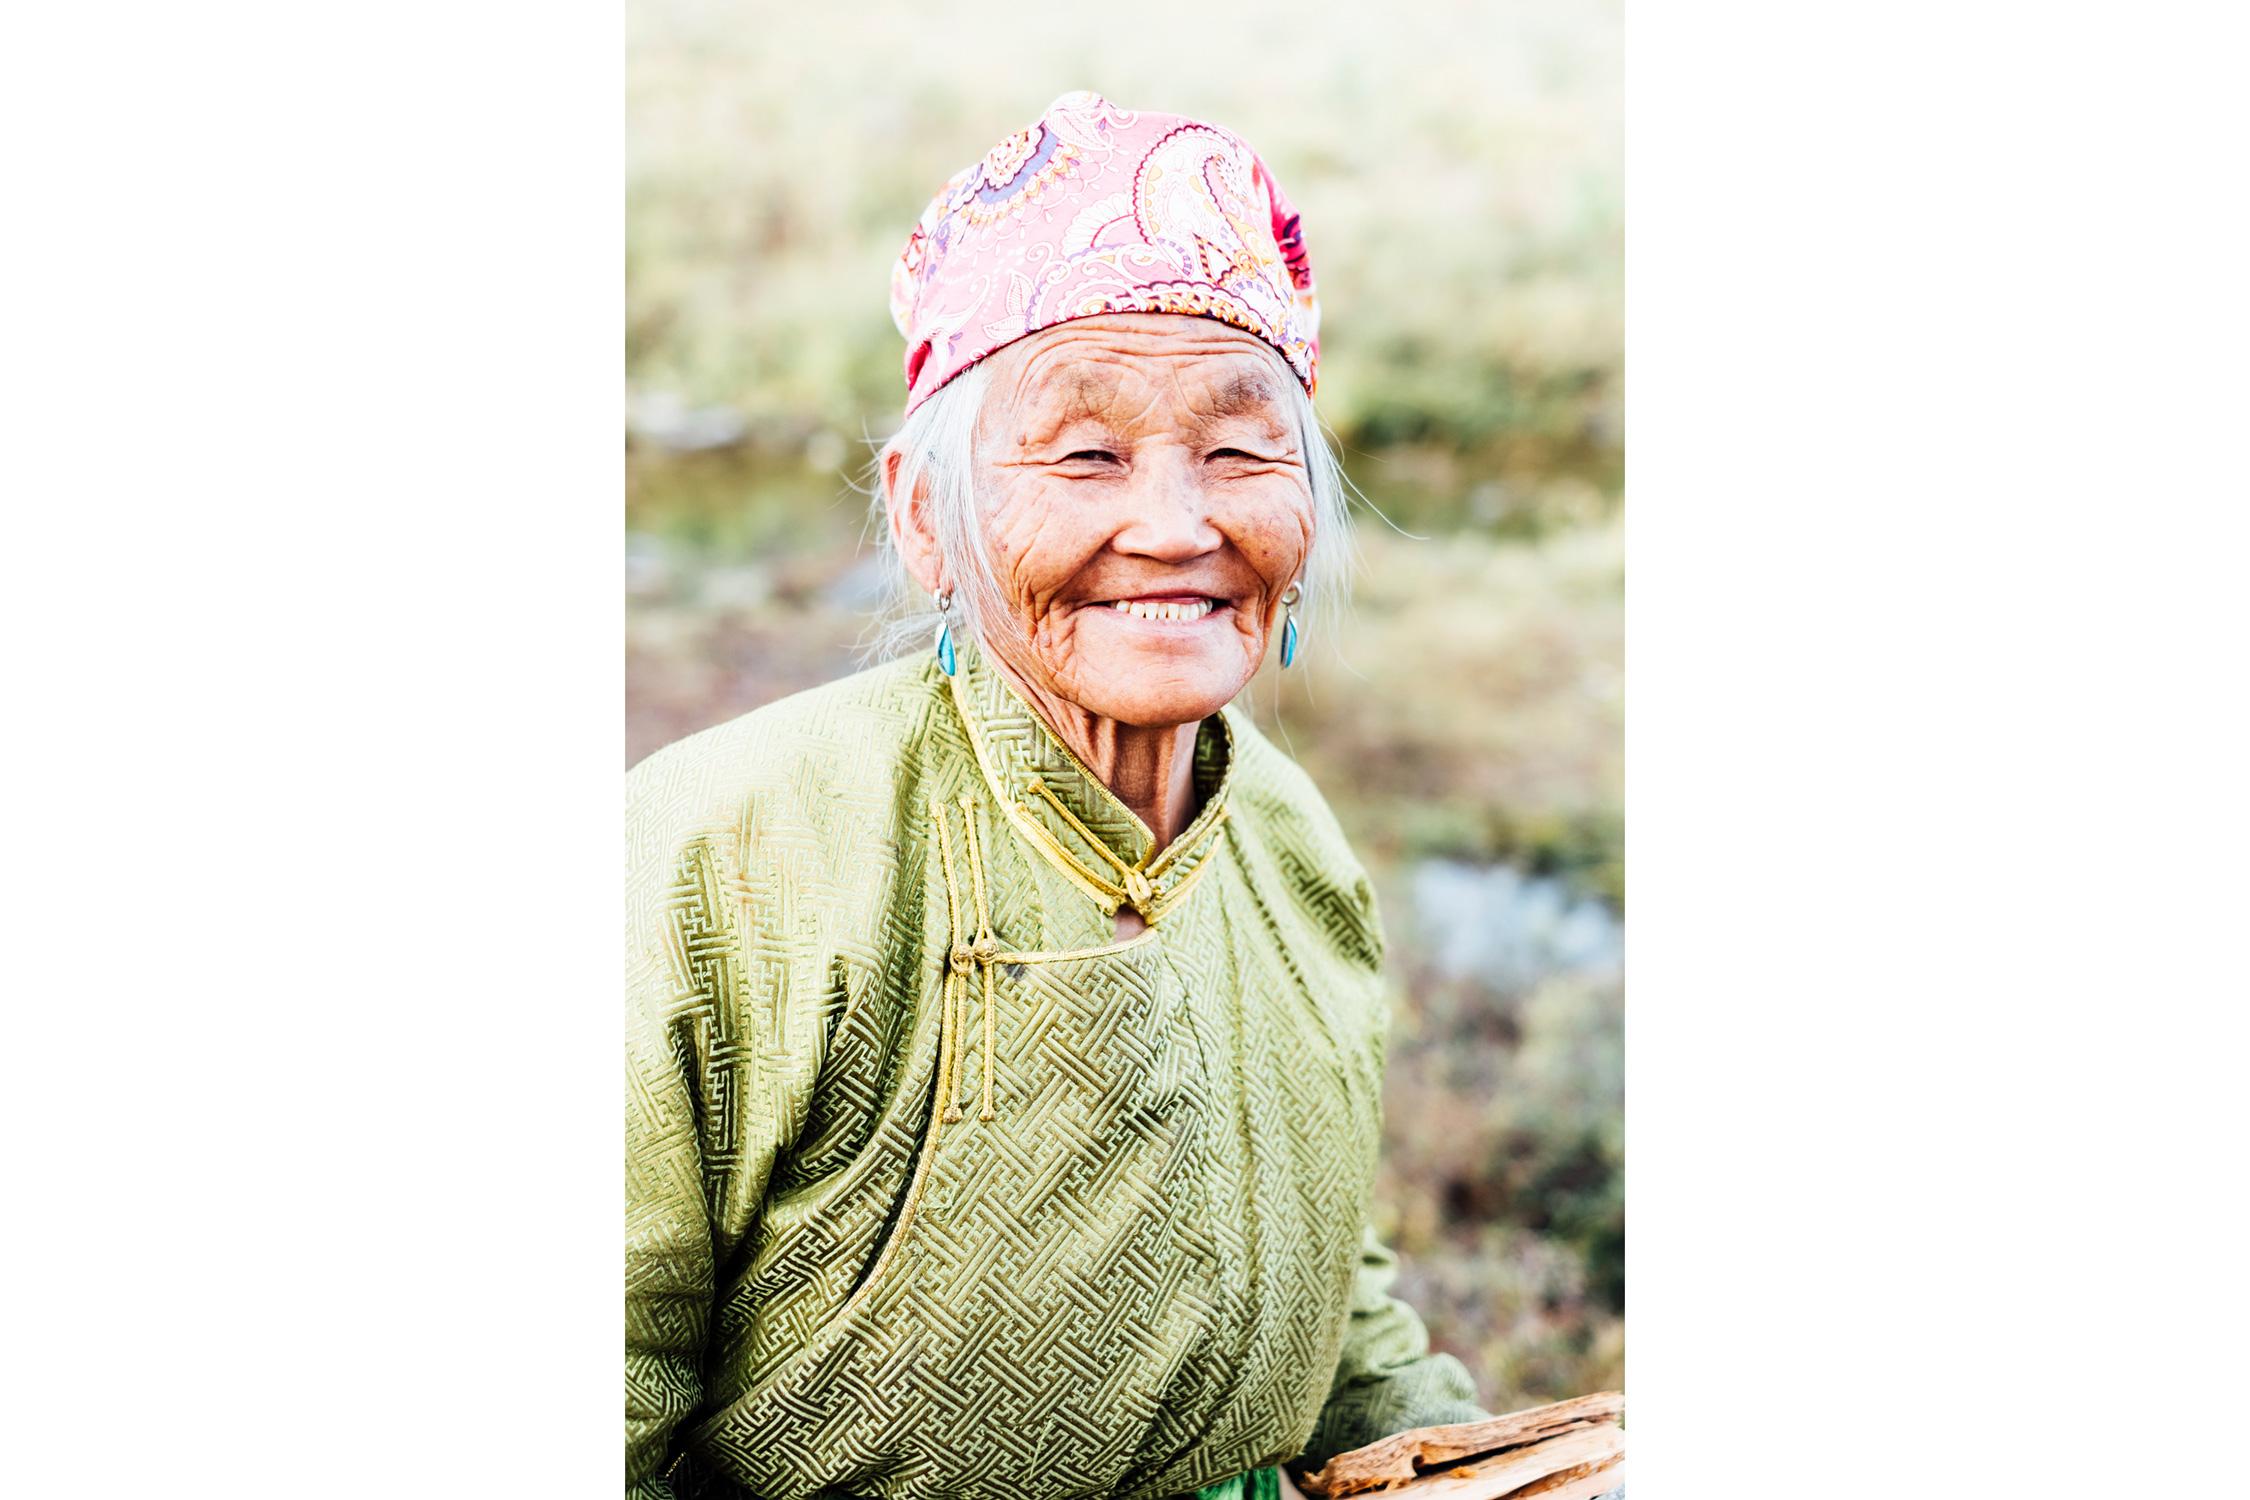 Katie_Mitchell_Photography_India_Mongolia_Worldwide_Travel_Photographer_07.jpg